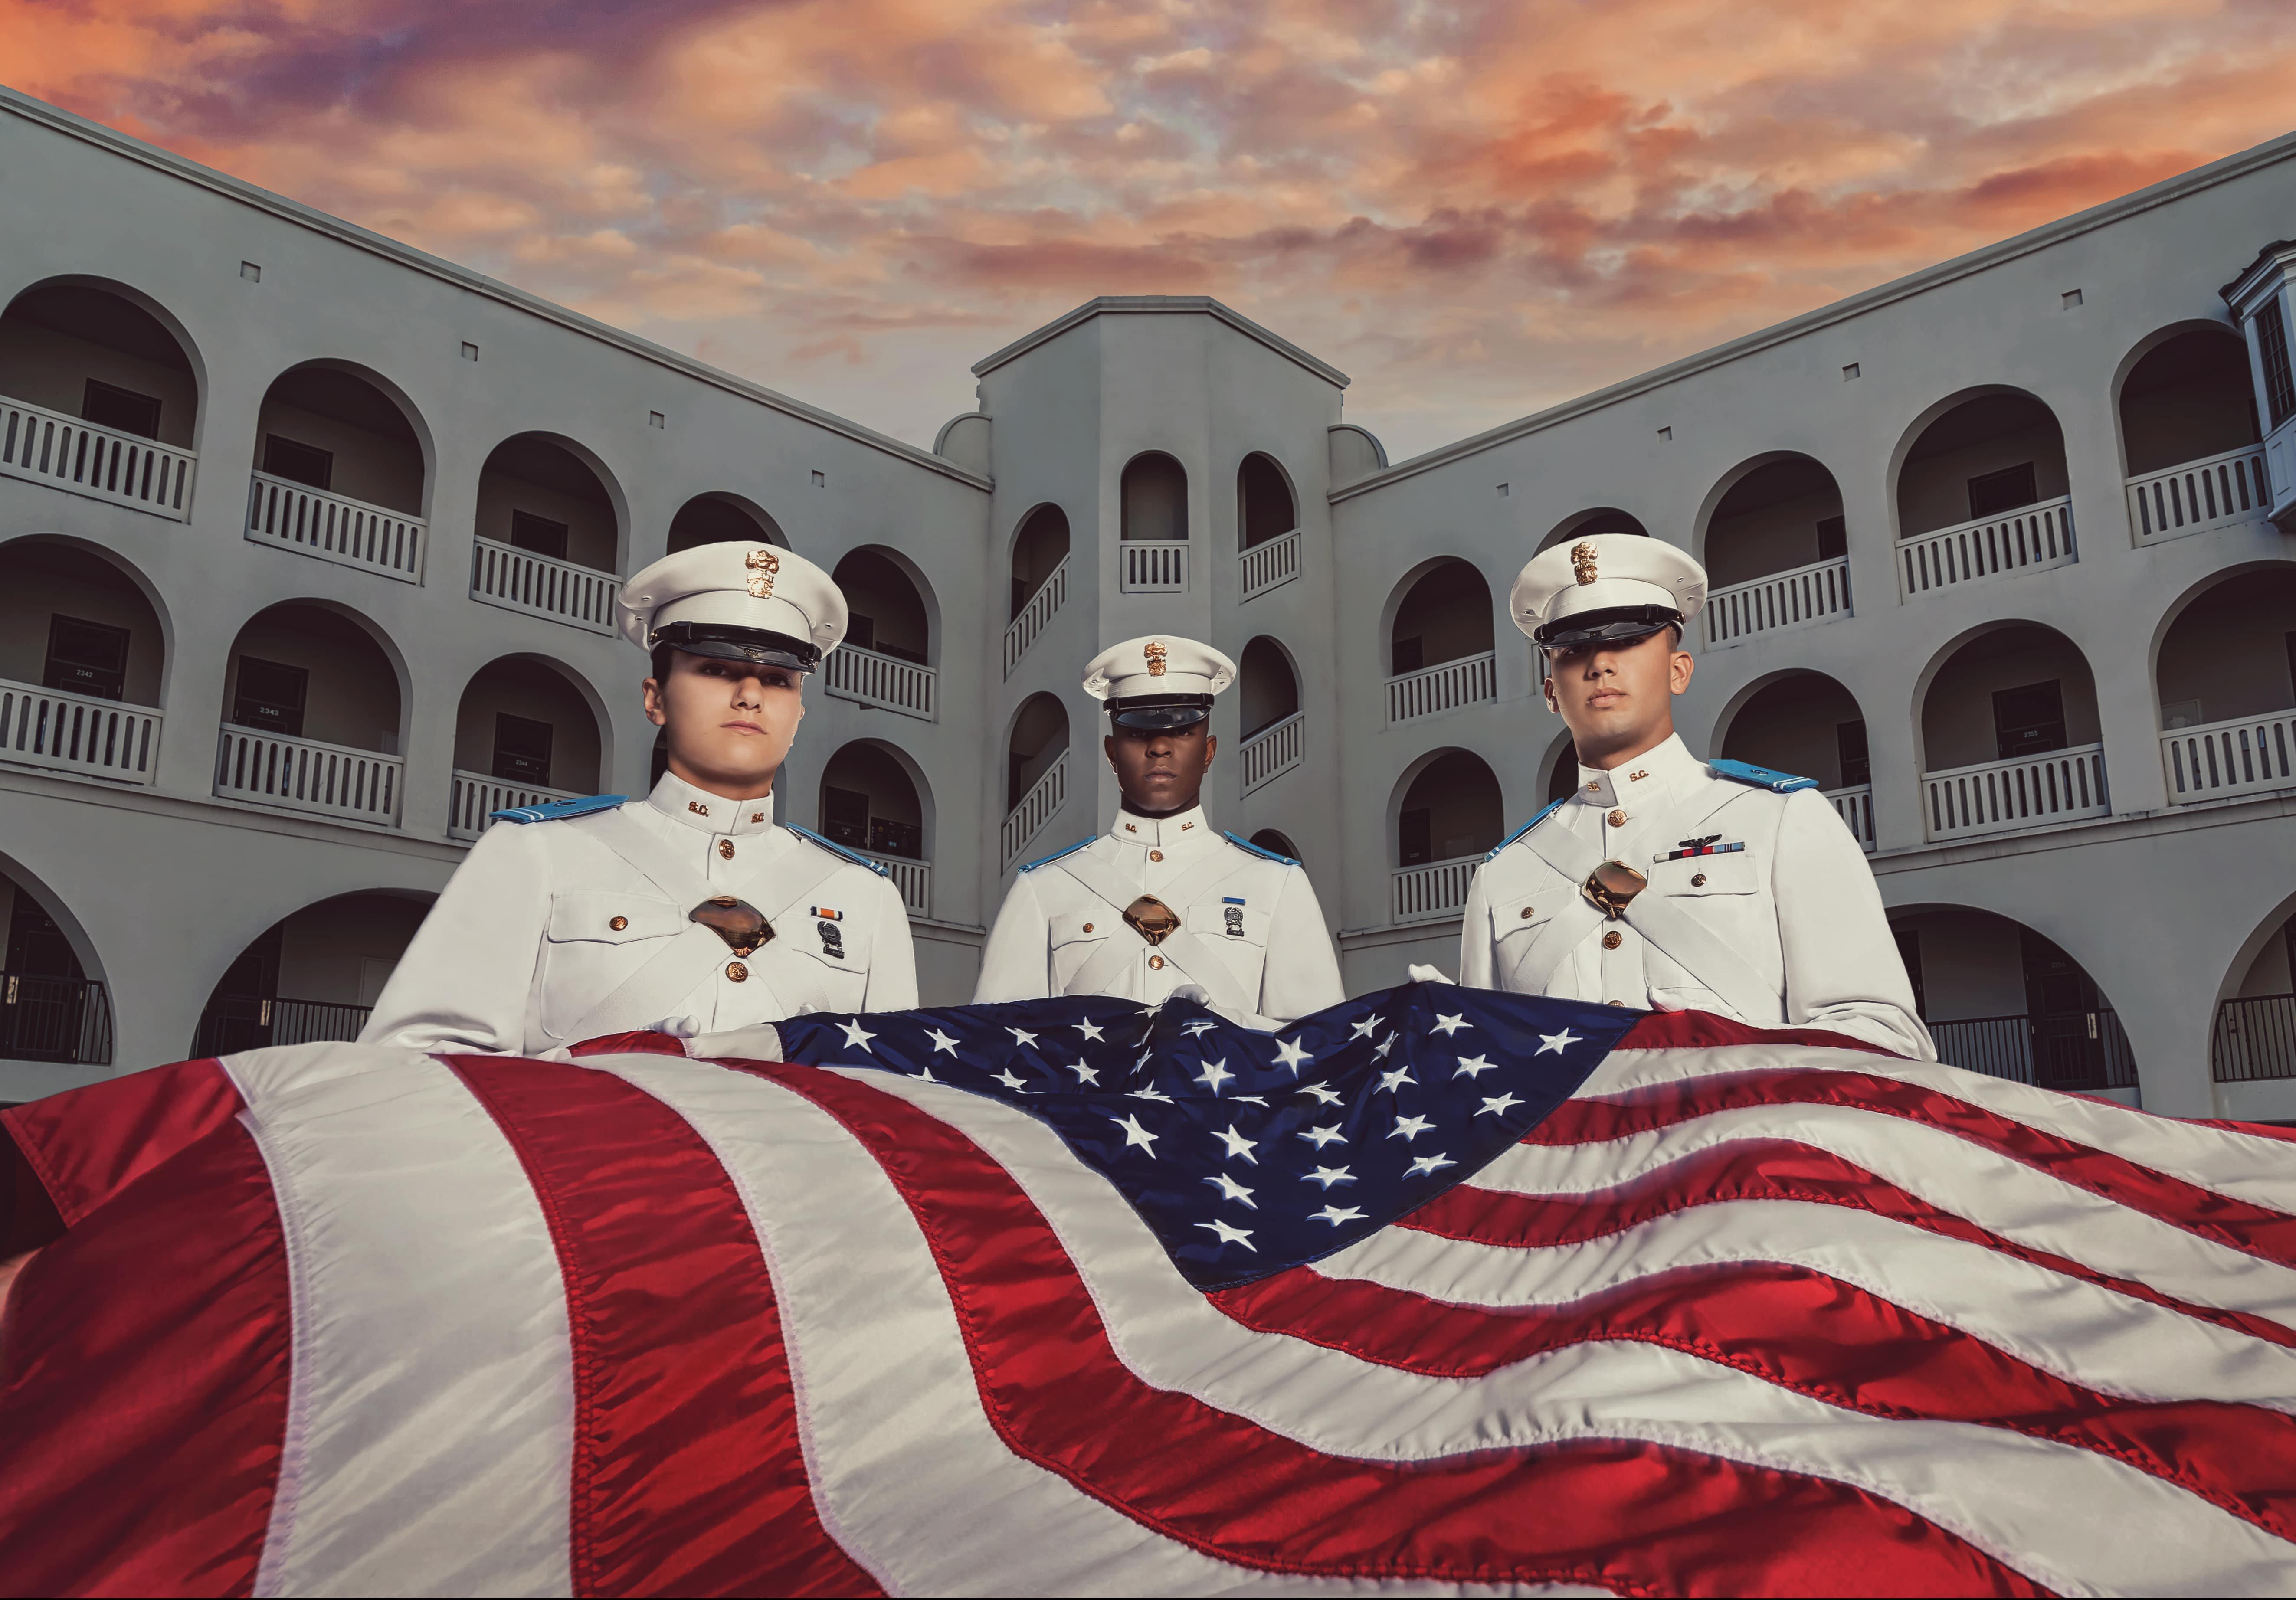 Citadel cadets holding american flag in barracks